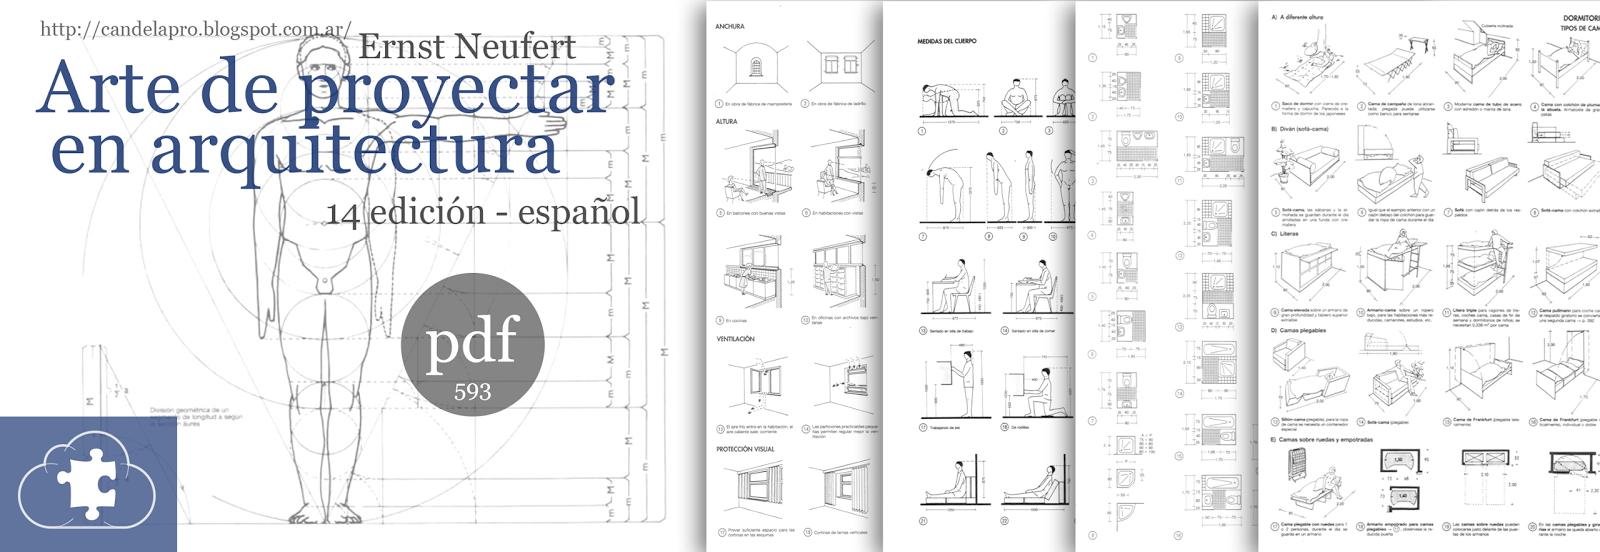 Candela pro neufert arte de proyectar en arquitectura for Medidas en arquitectura pdf